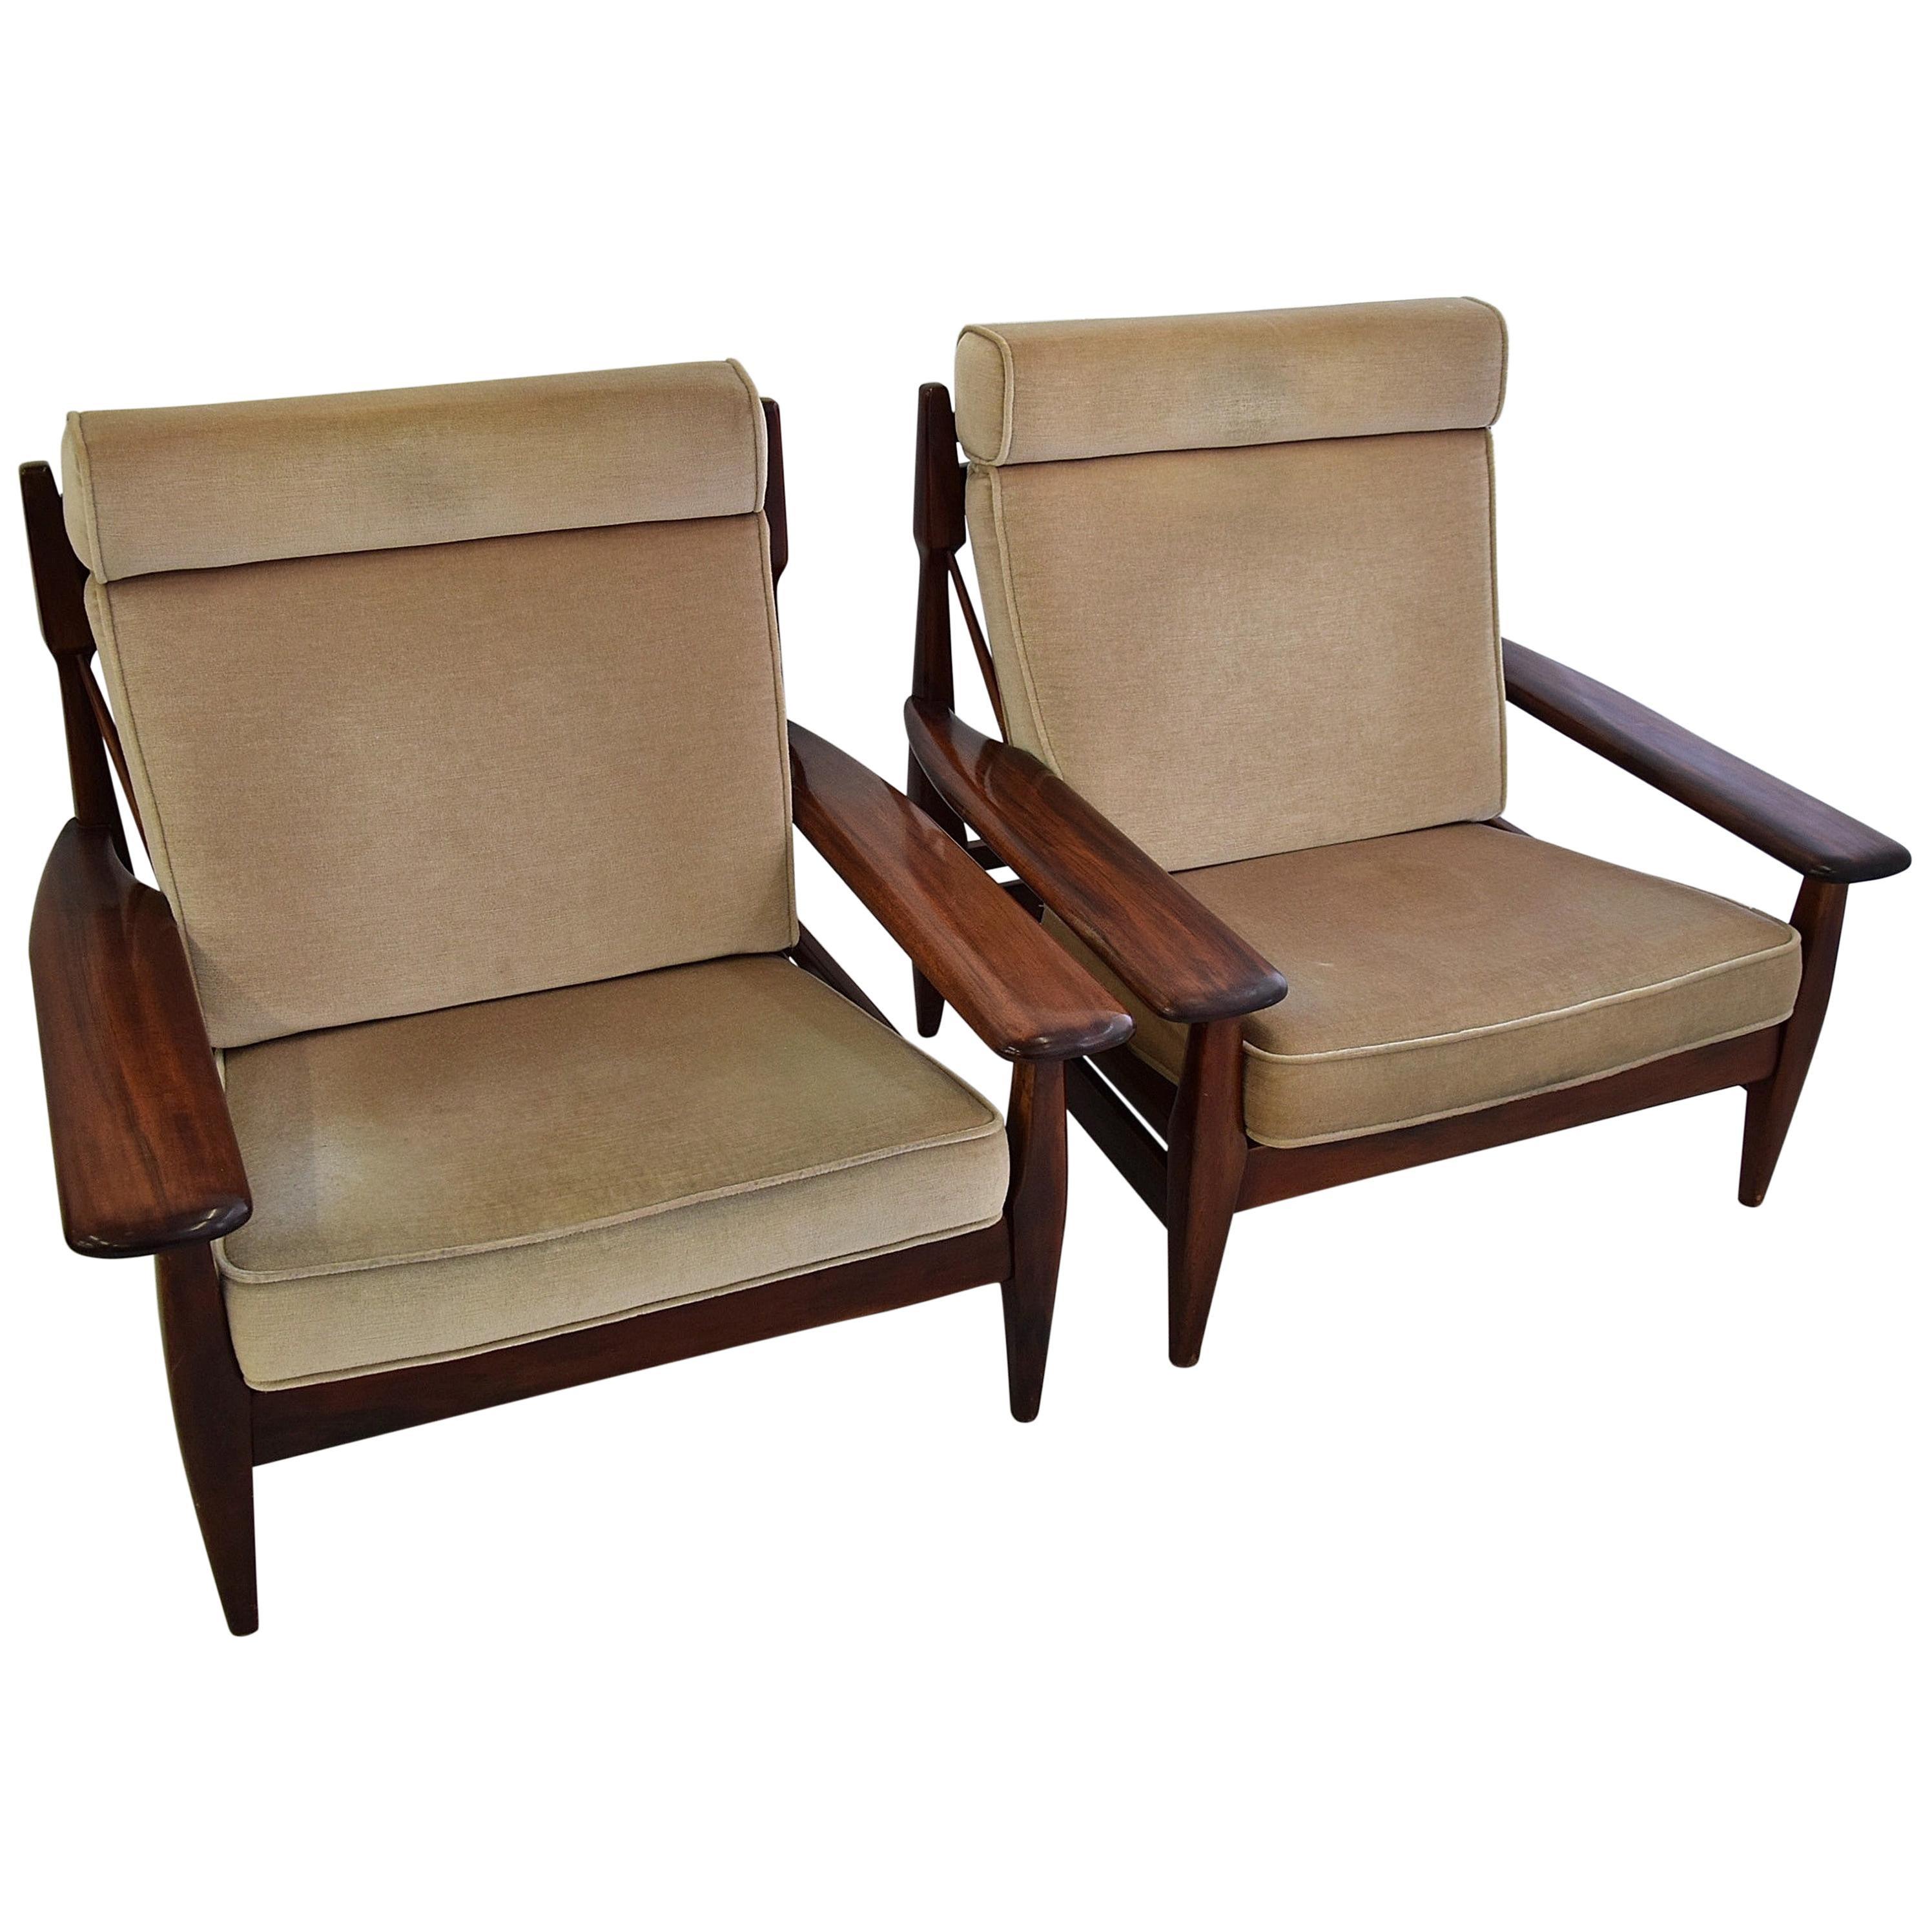 Brazilian Mid-Century Modern Wooden Armchairs in the Style of Jean Gillon